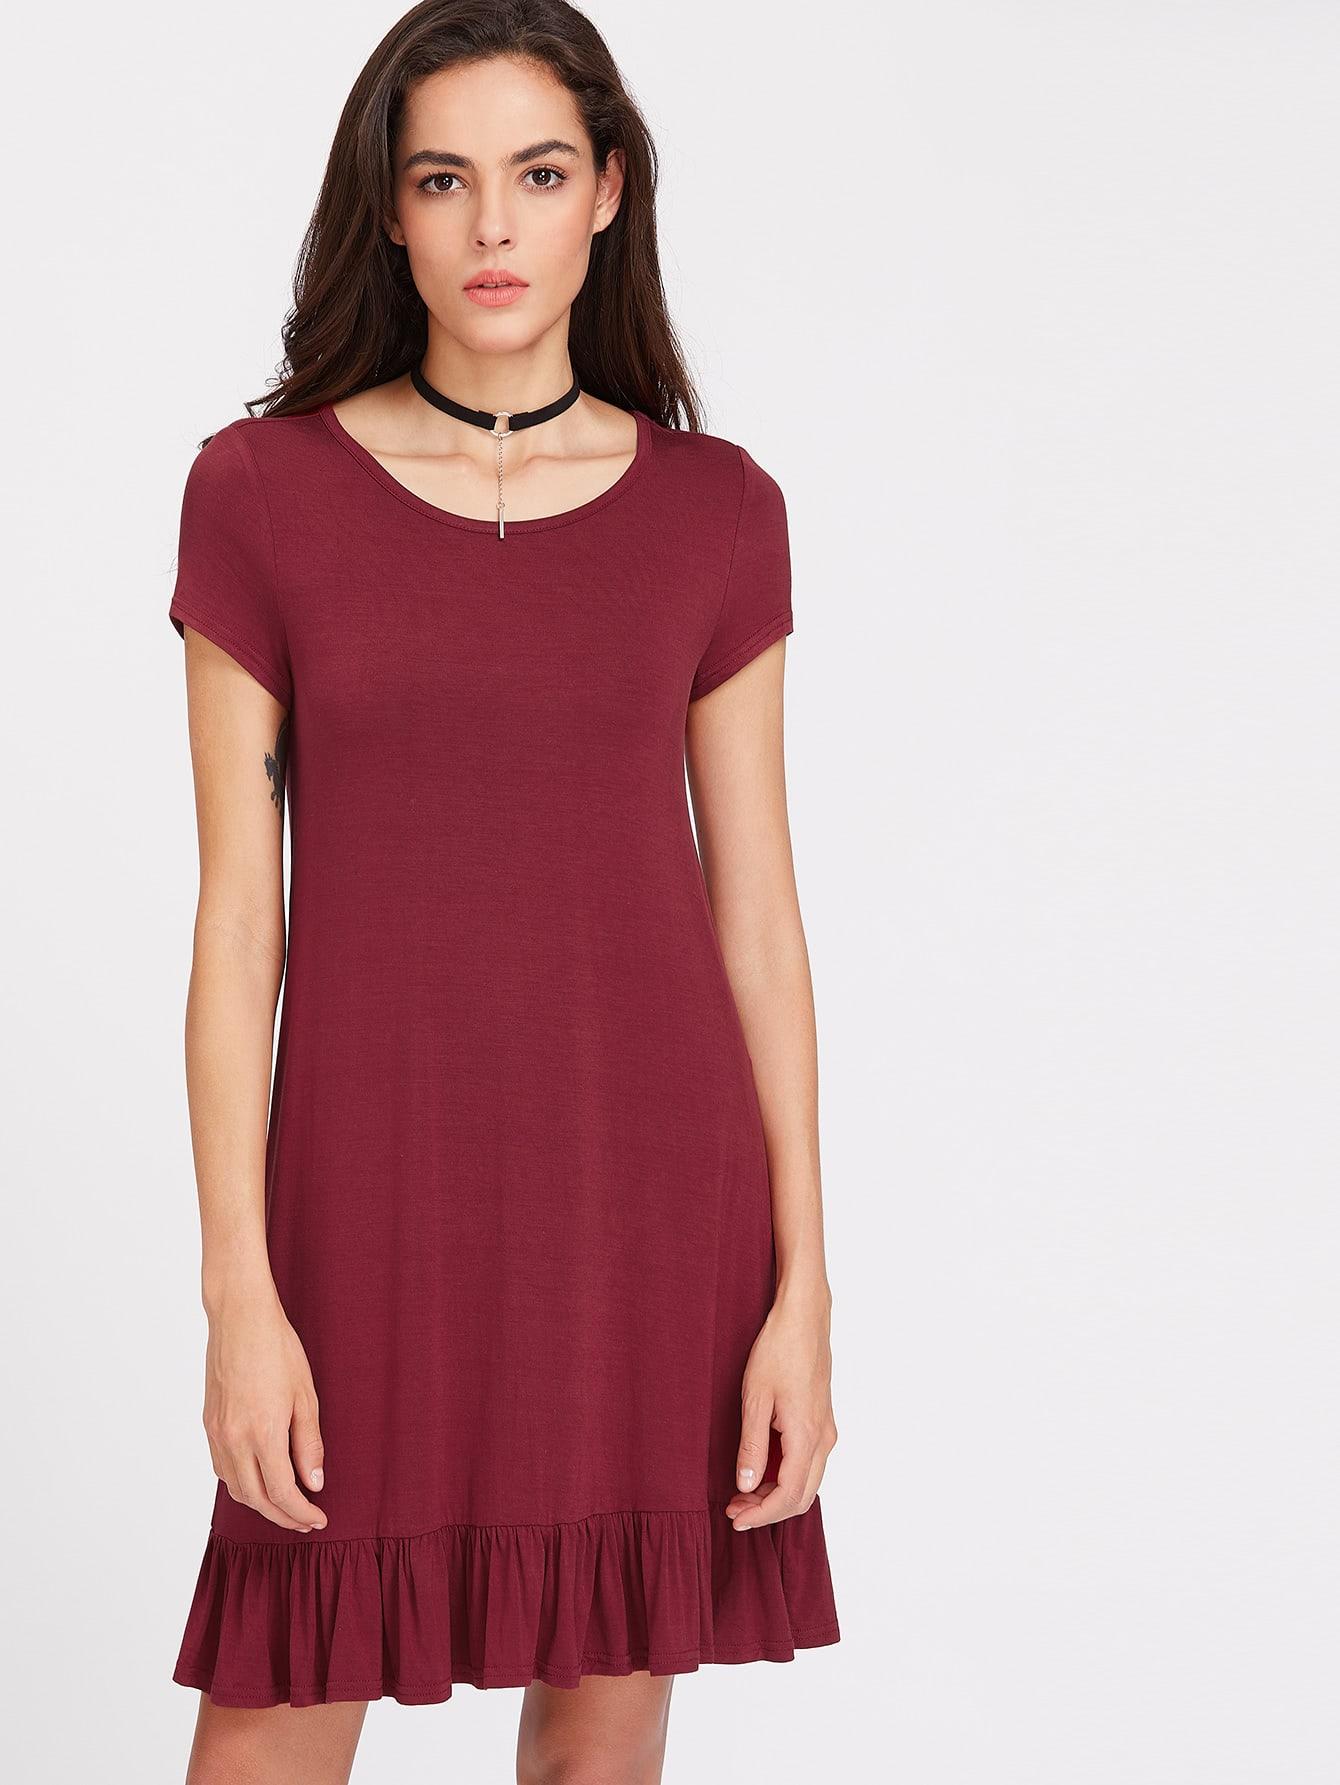 Ruffle Hem Tee Dress dress170411703